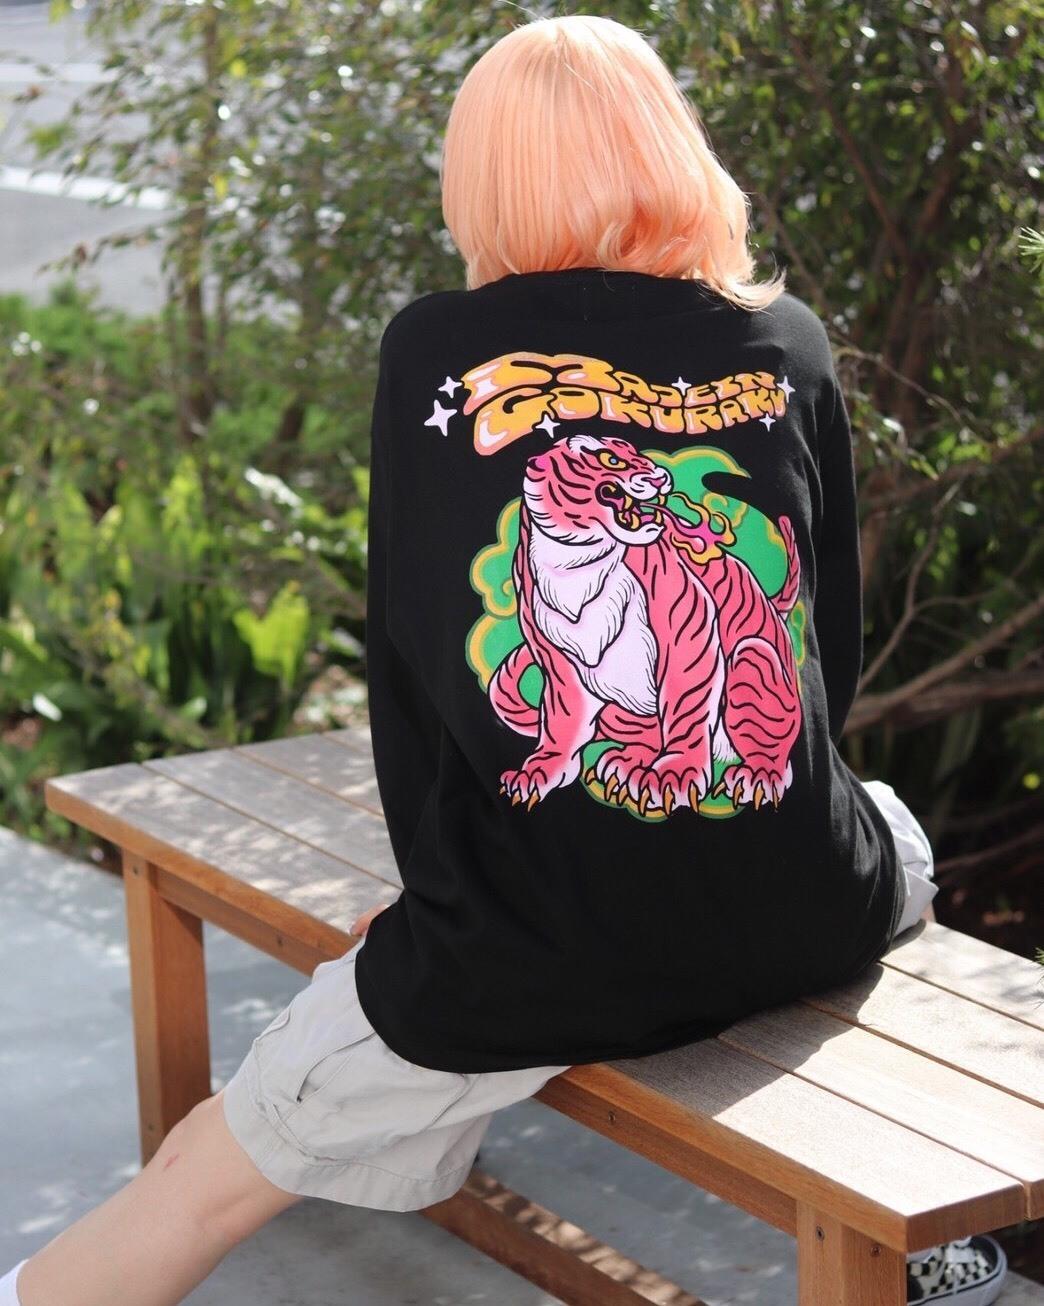 【数量限定予約販売】MAID in 極楽 long sleeve T-shirt【black】